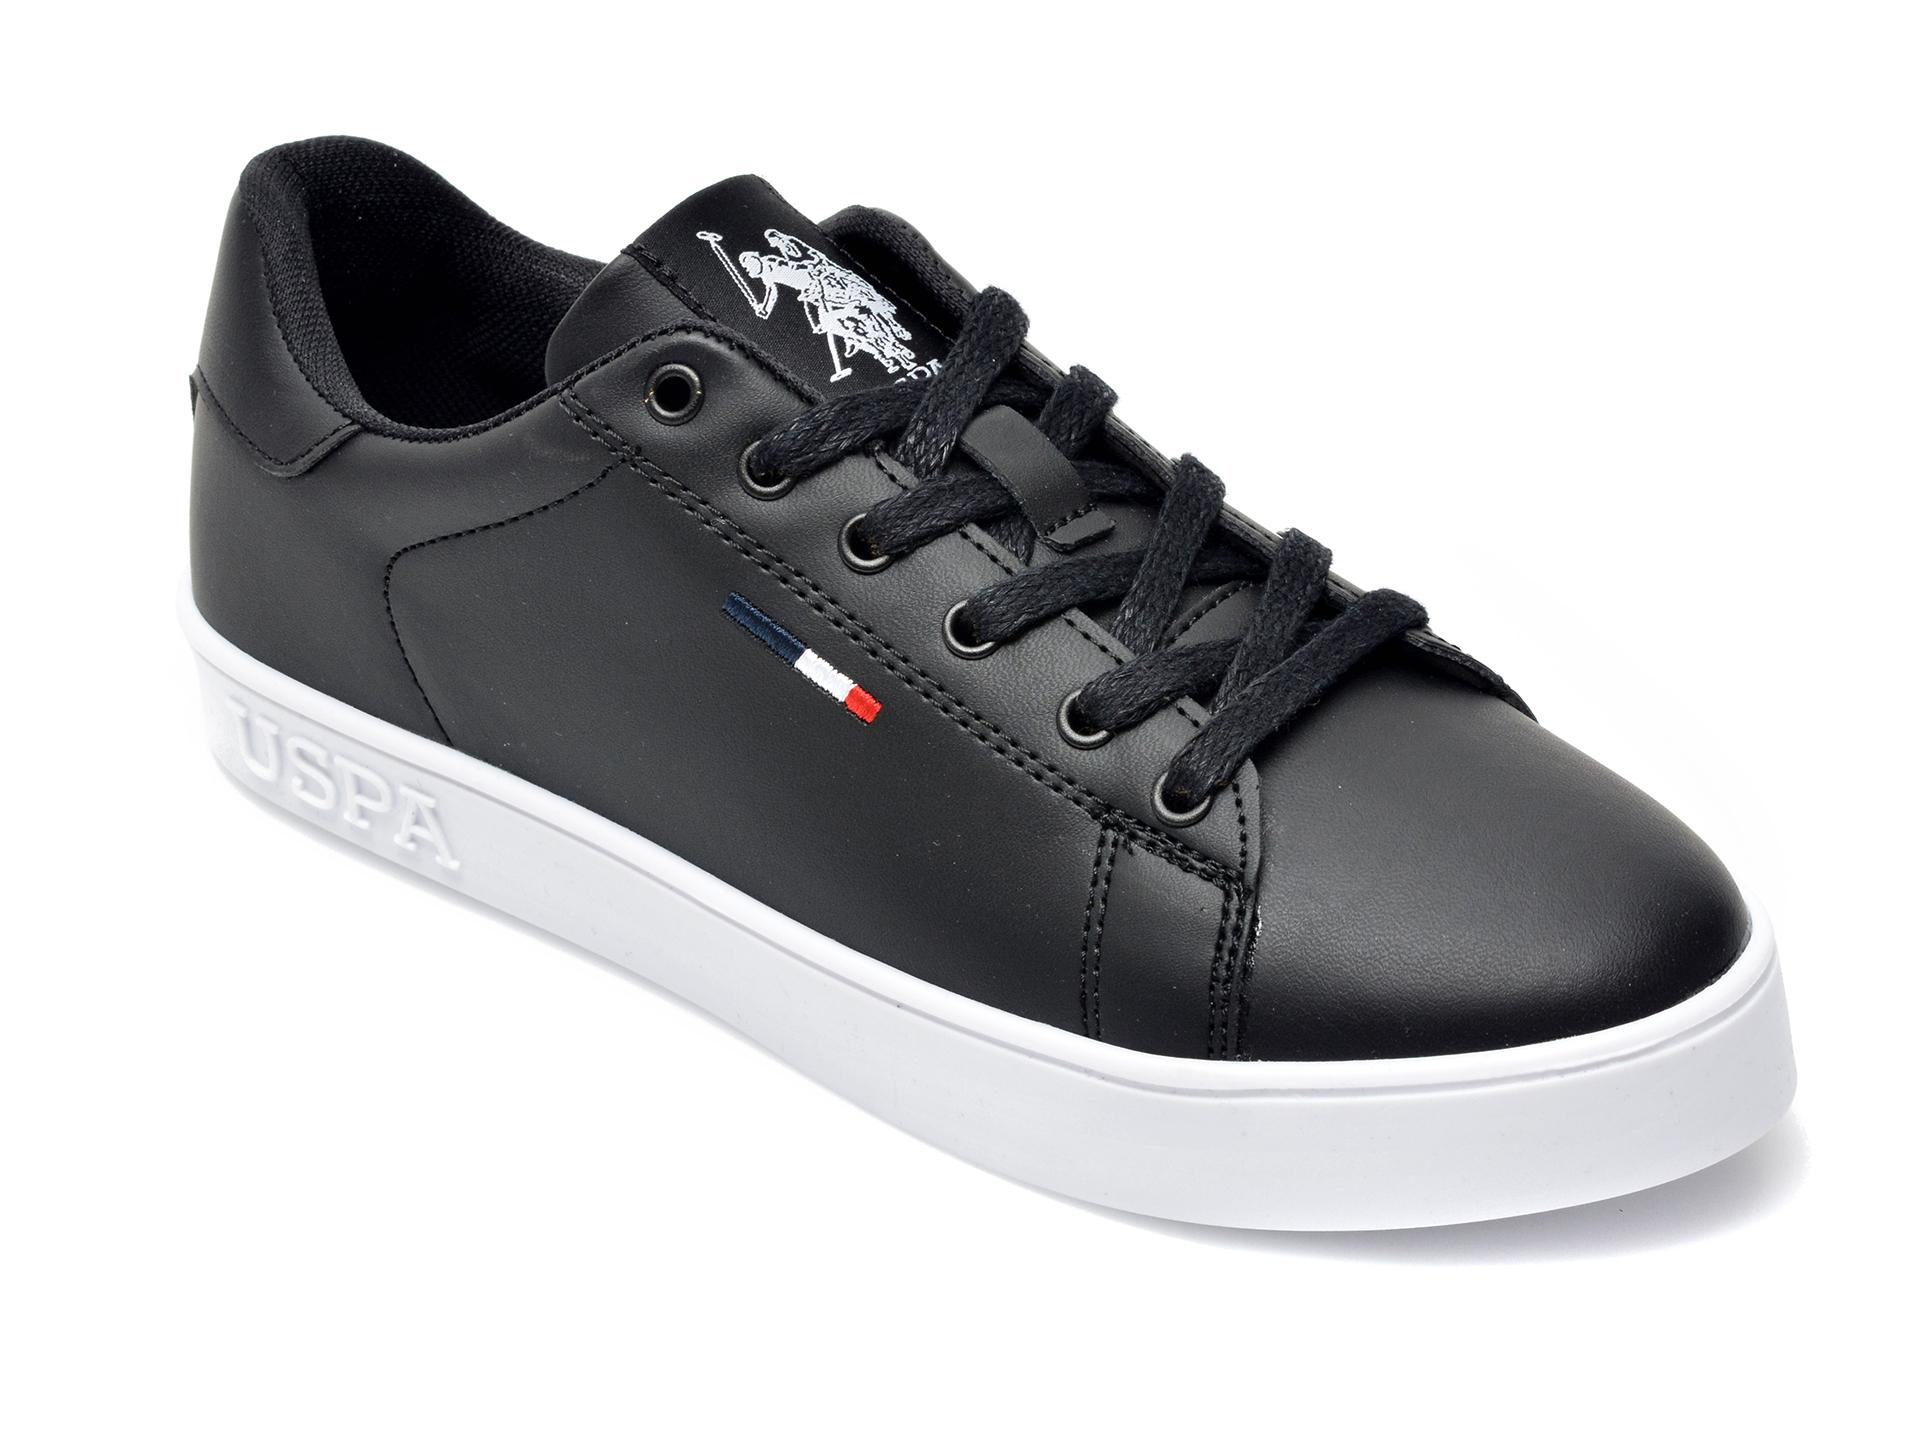 Pantofi sport US POLO ASSN negri, FLEX1FX, din piele ecologica imagine 2021 otter.ro